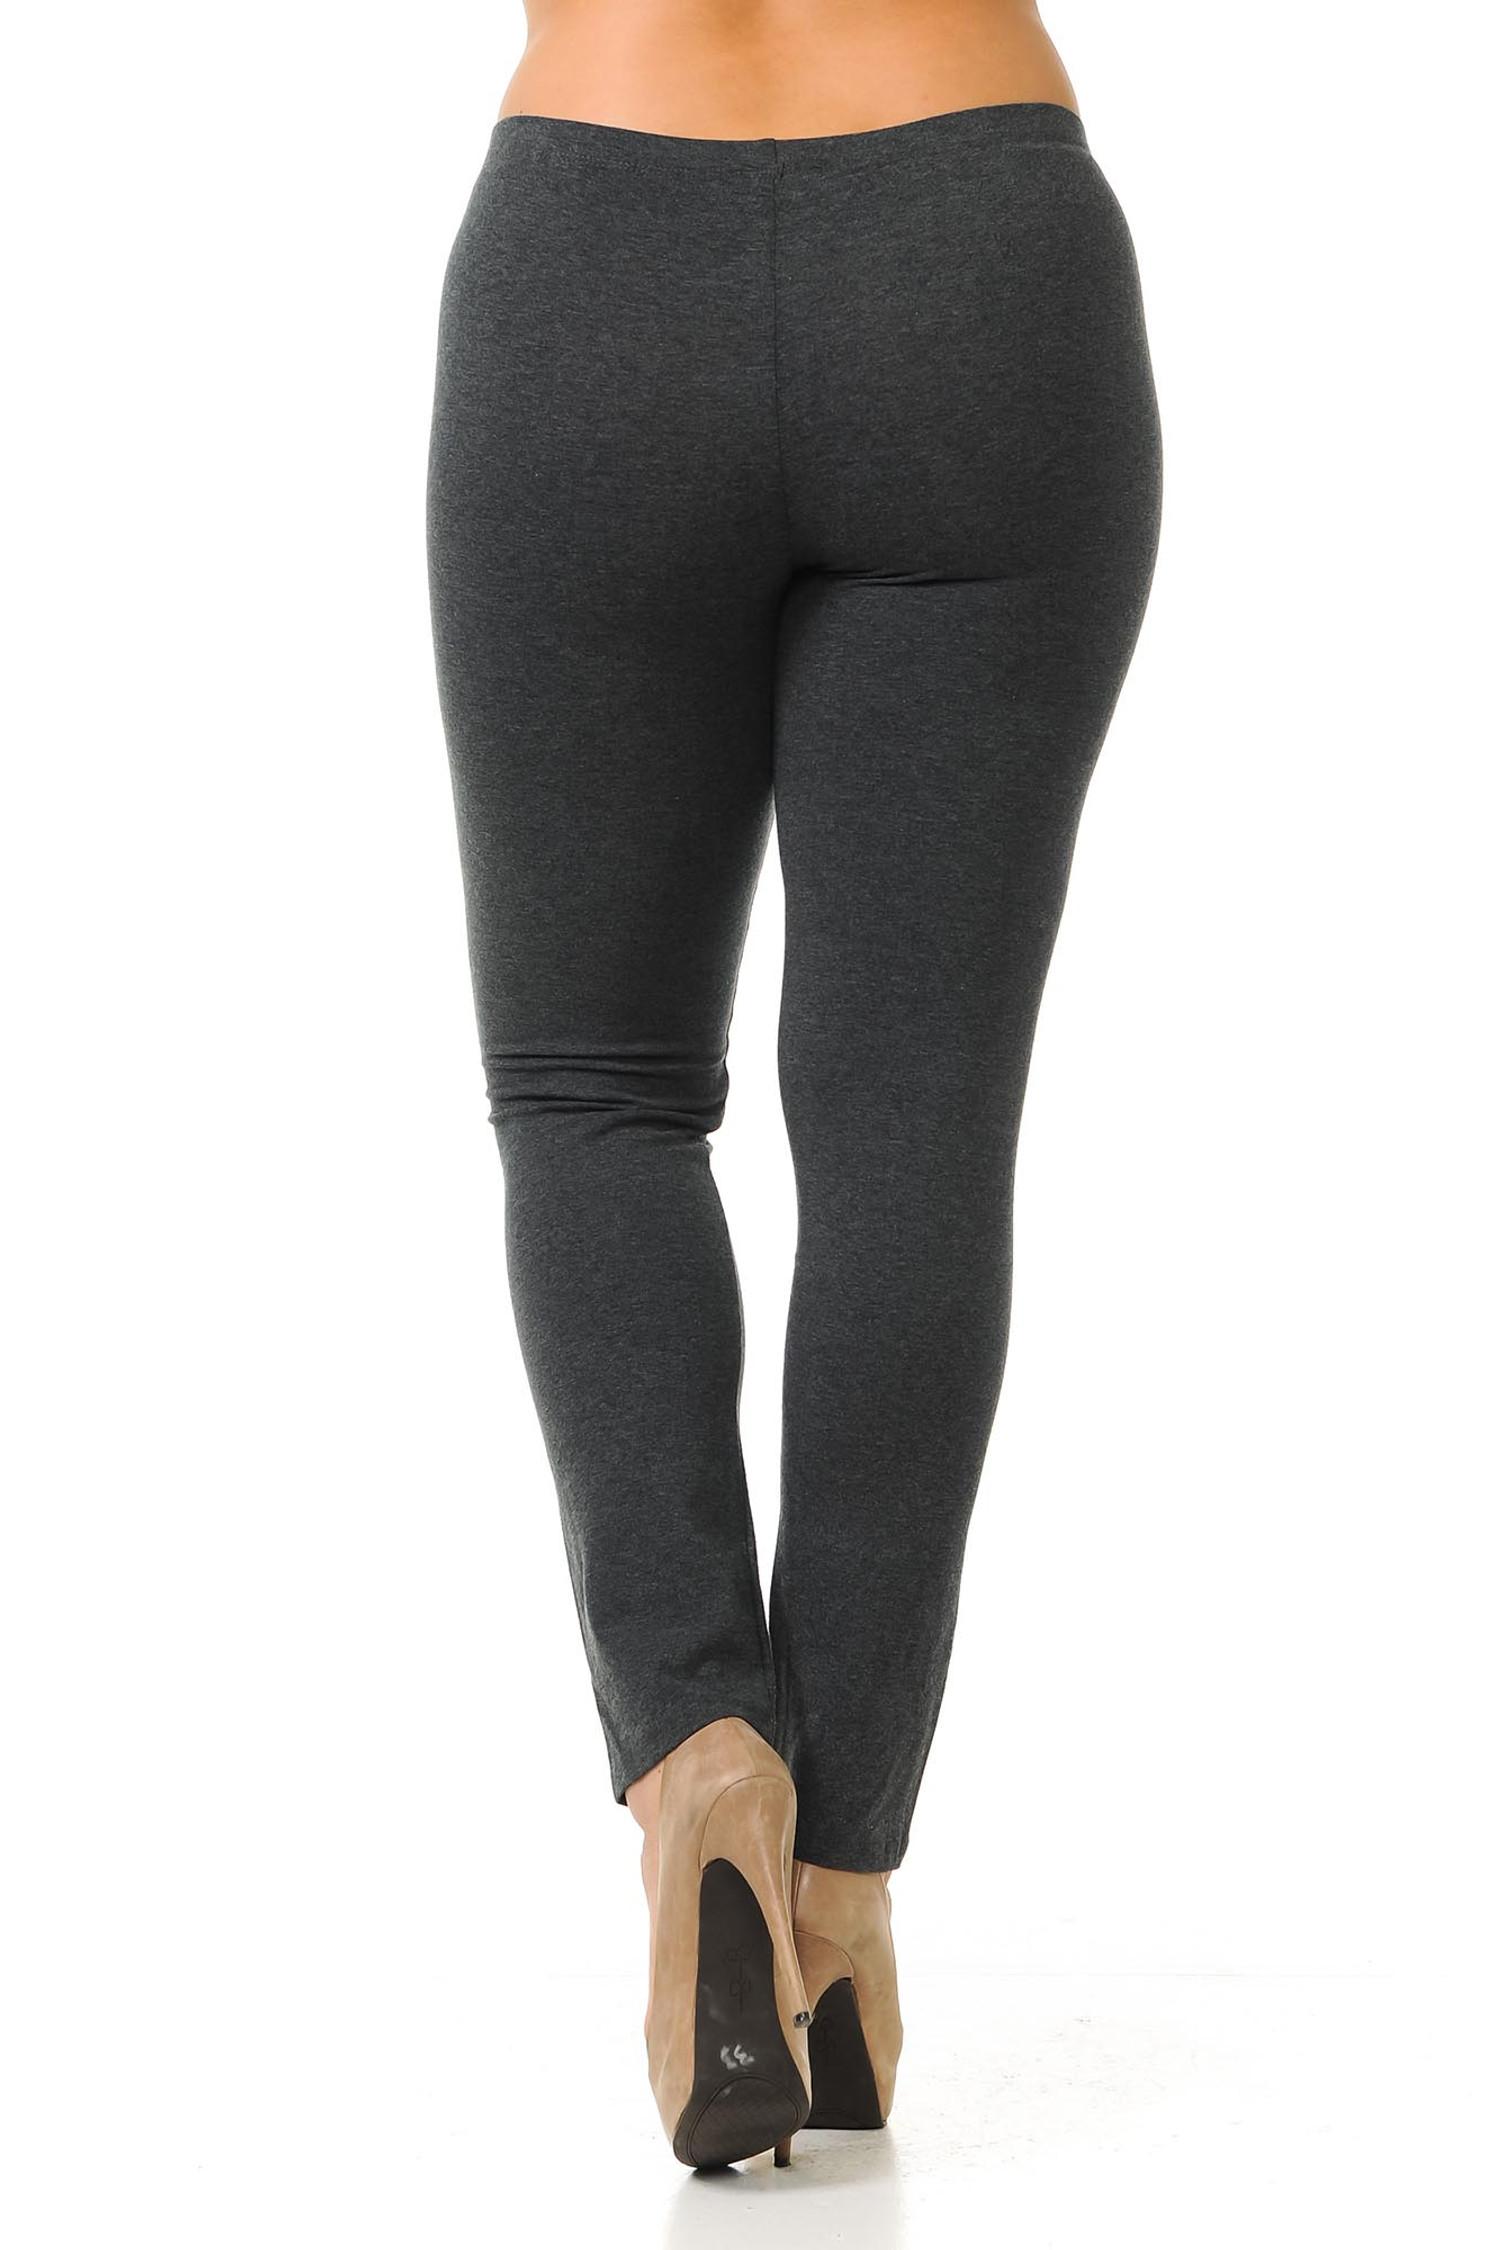 USA Cotton Full Length Leggings - Plus Size